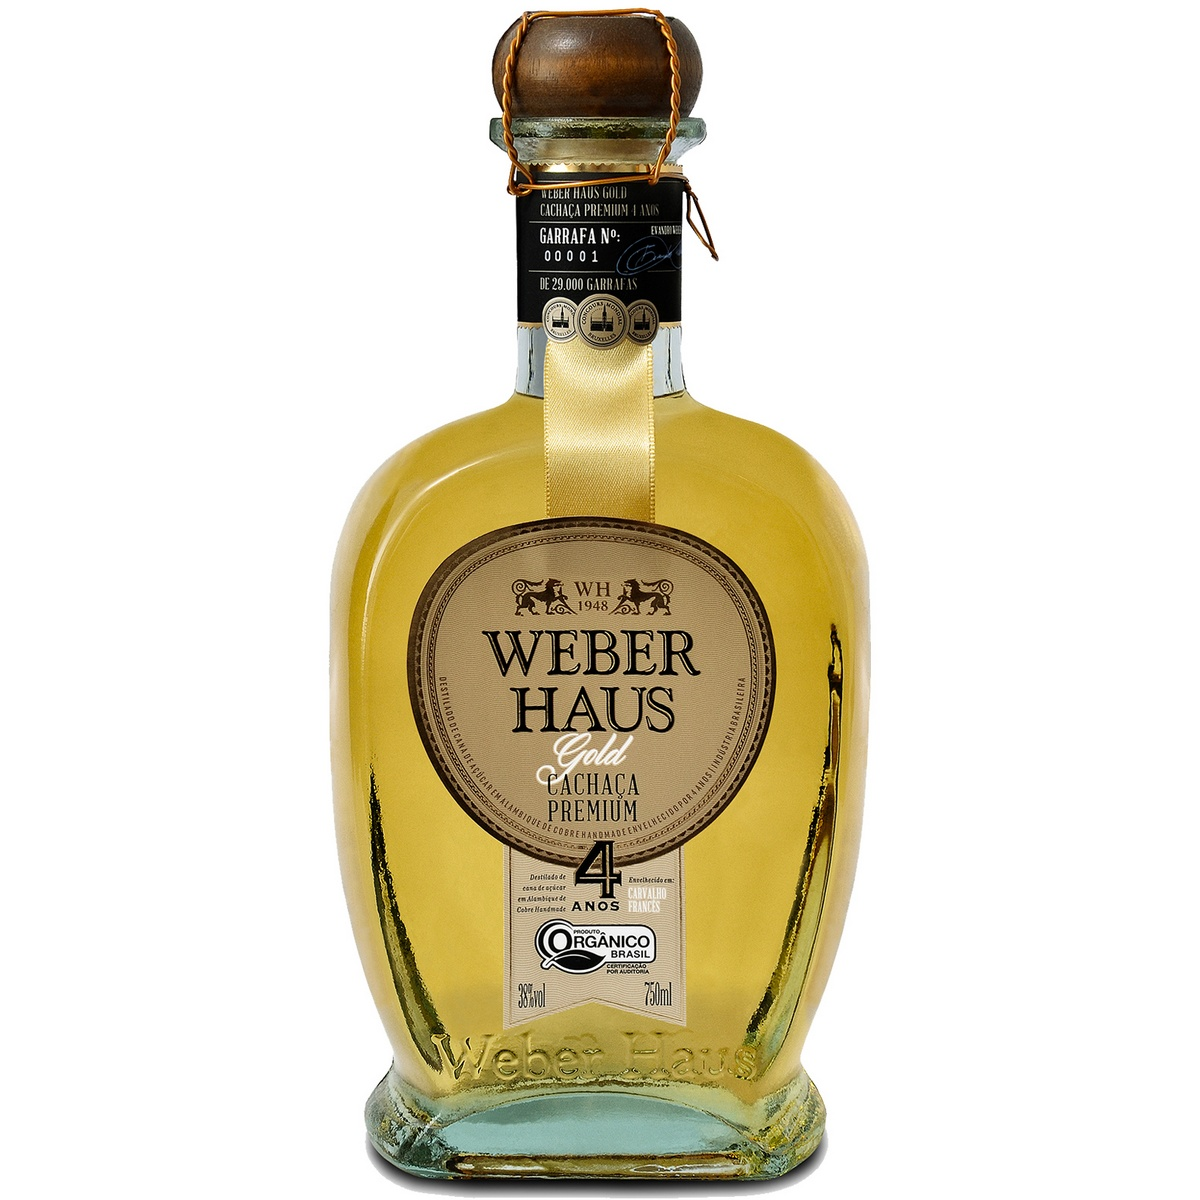 Cachaça Weber Haus Premium Gold Orgânica 4 Anos 750ml